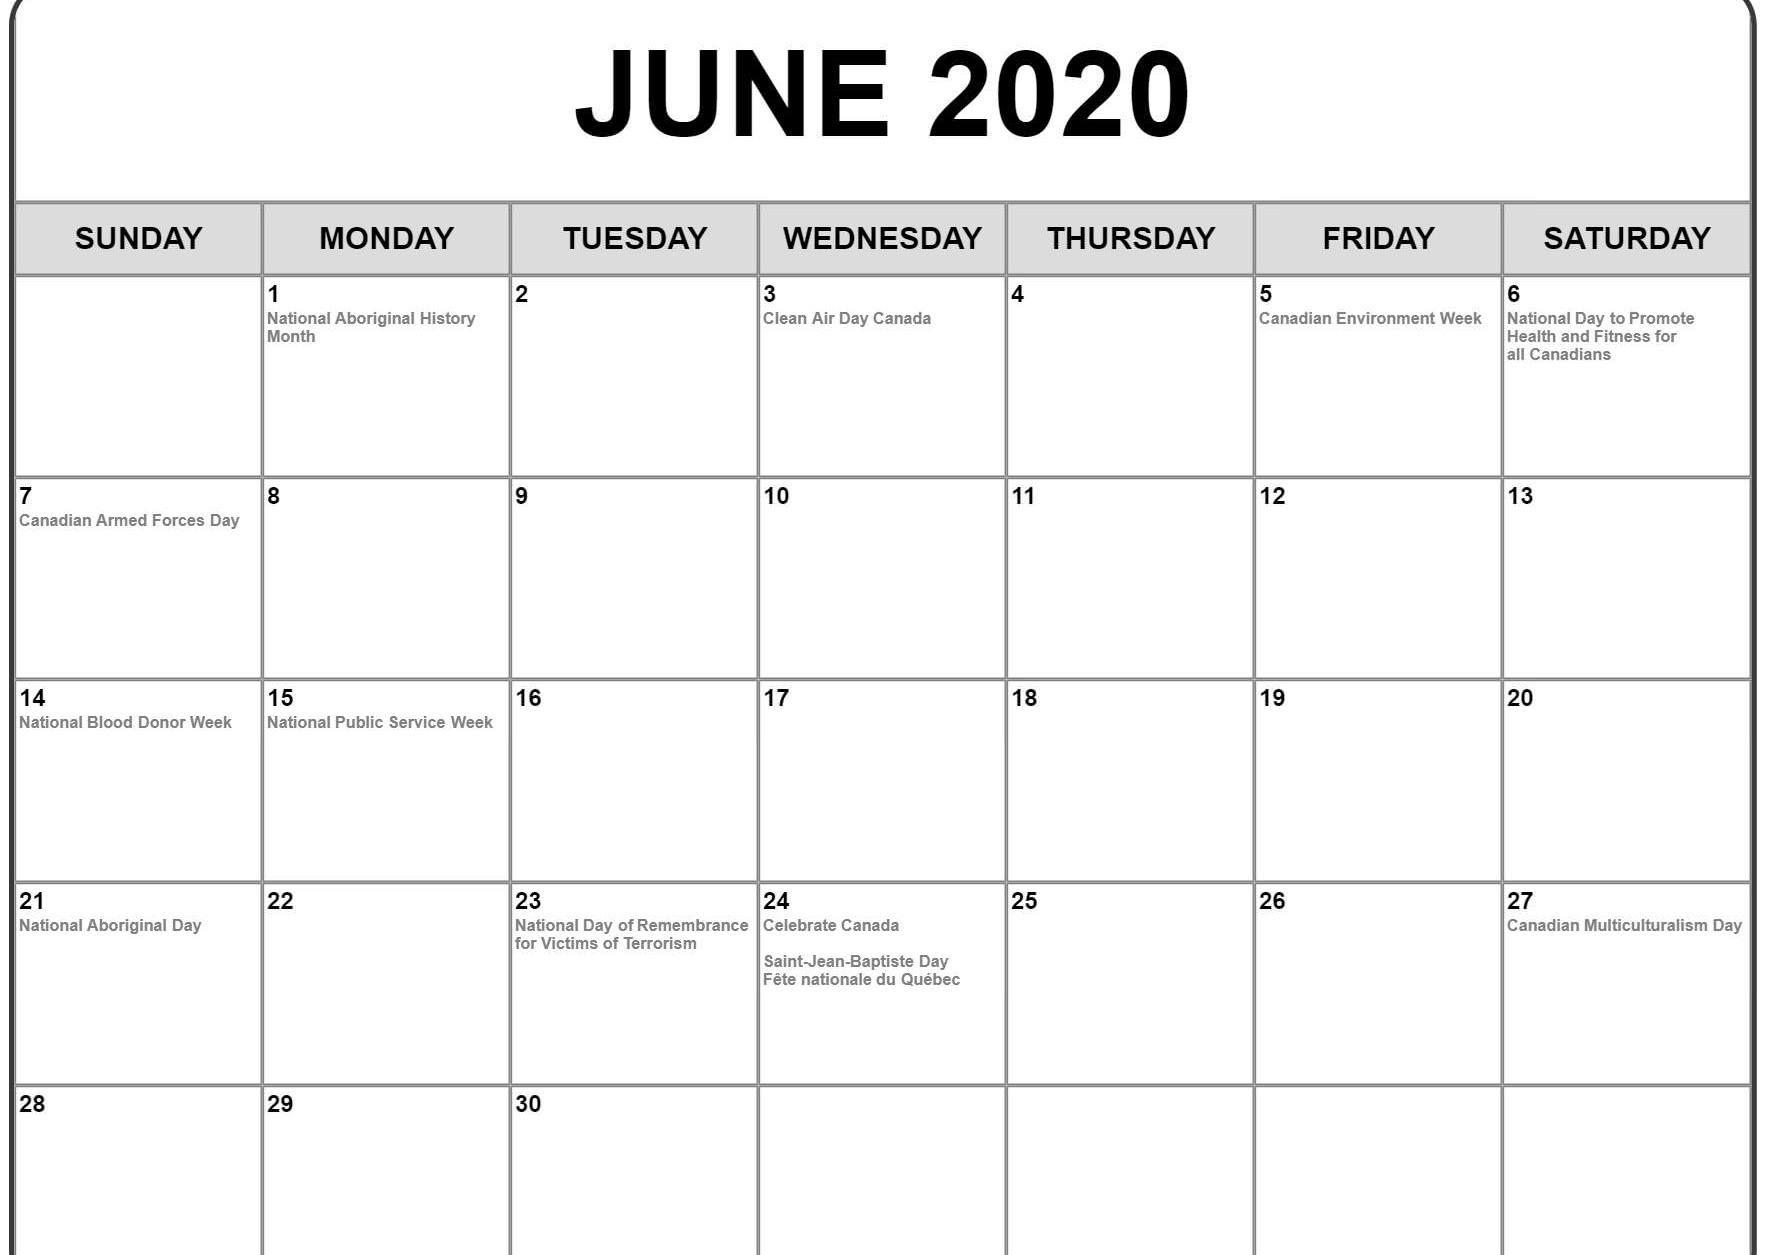 June 2020 Calendar With Holidays | Monthly Calendar Template